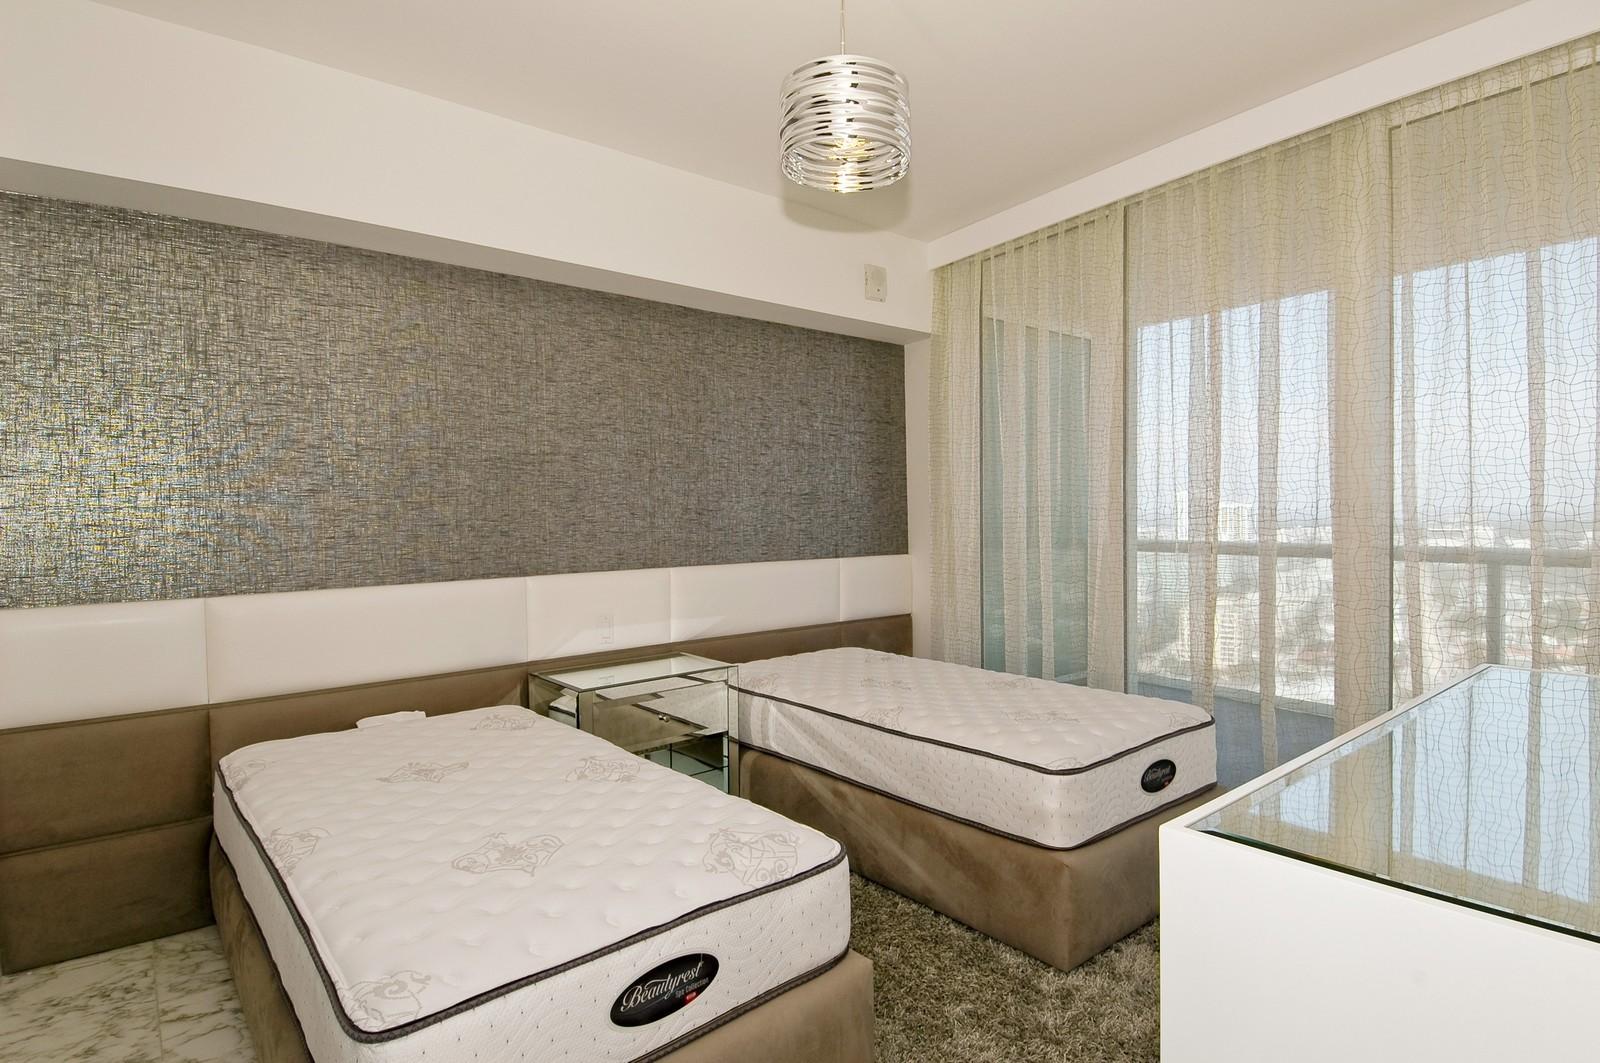 Real Estate Photography - 450 Alton Rd, Unit 2910, Miami Beach, FL, 33139 - Bedroom